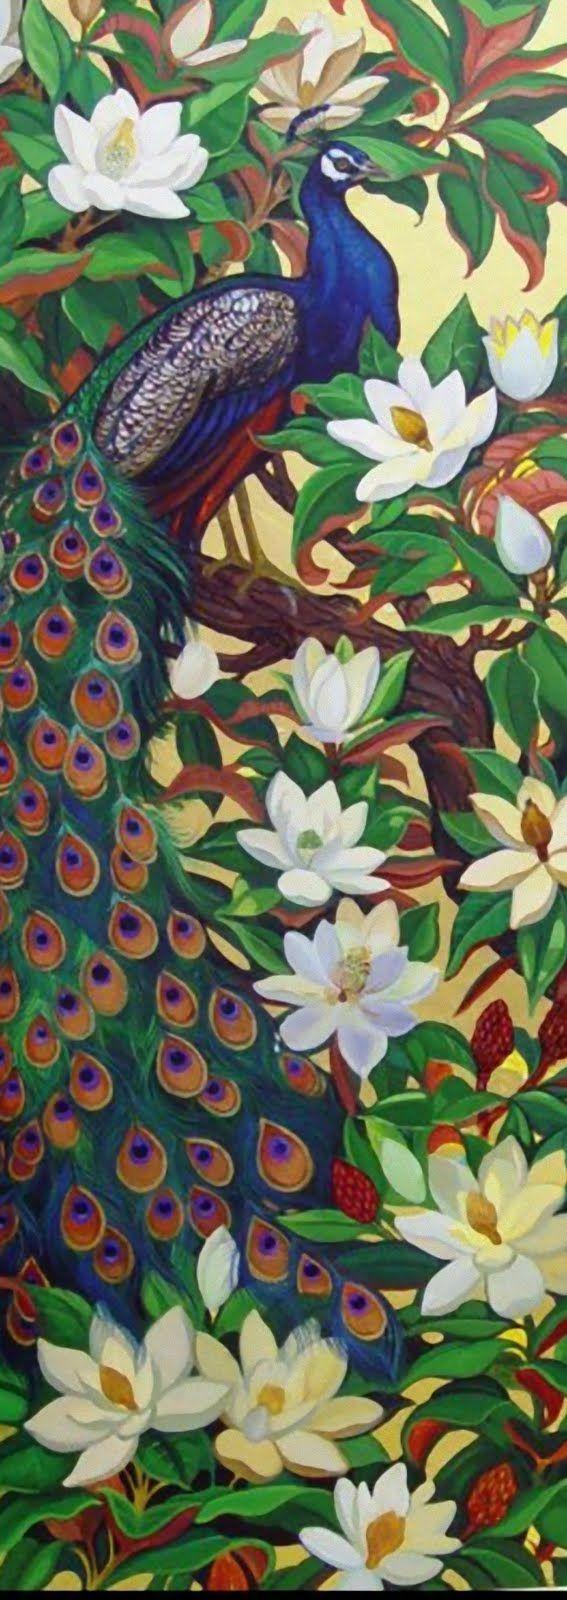 Rambunctious Mind!!!: Peacock Glass Paintings - A work in progress567 x 1600   134.4KB   ramblingsofmyrambunctiousmi...